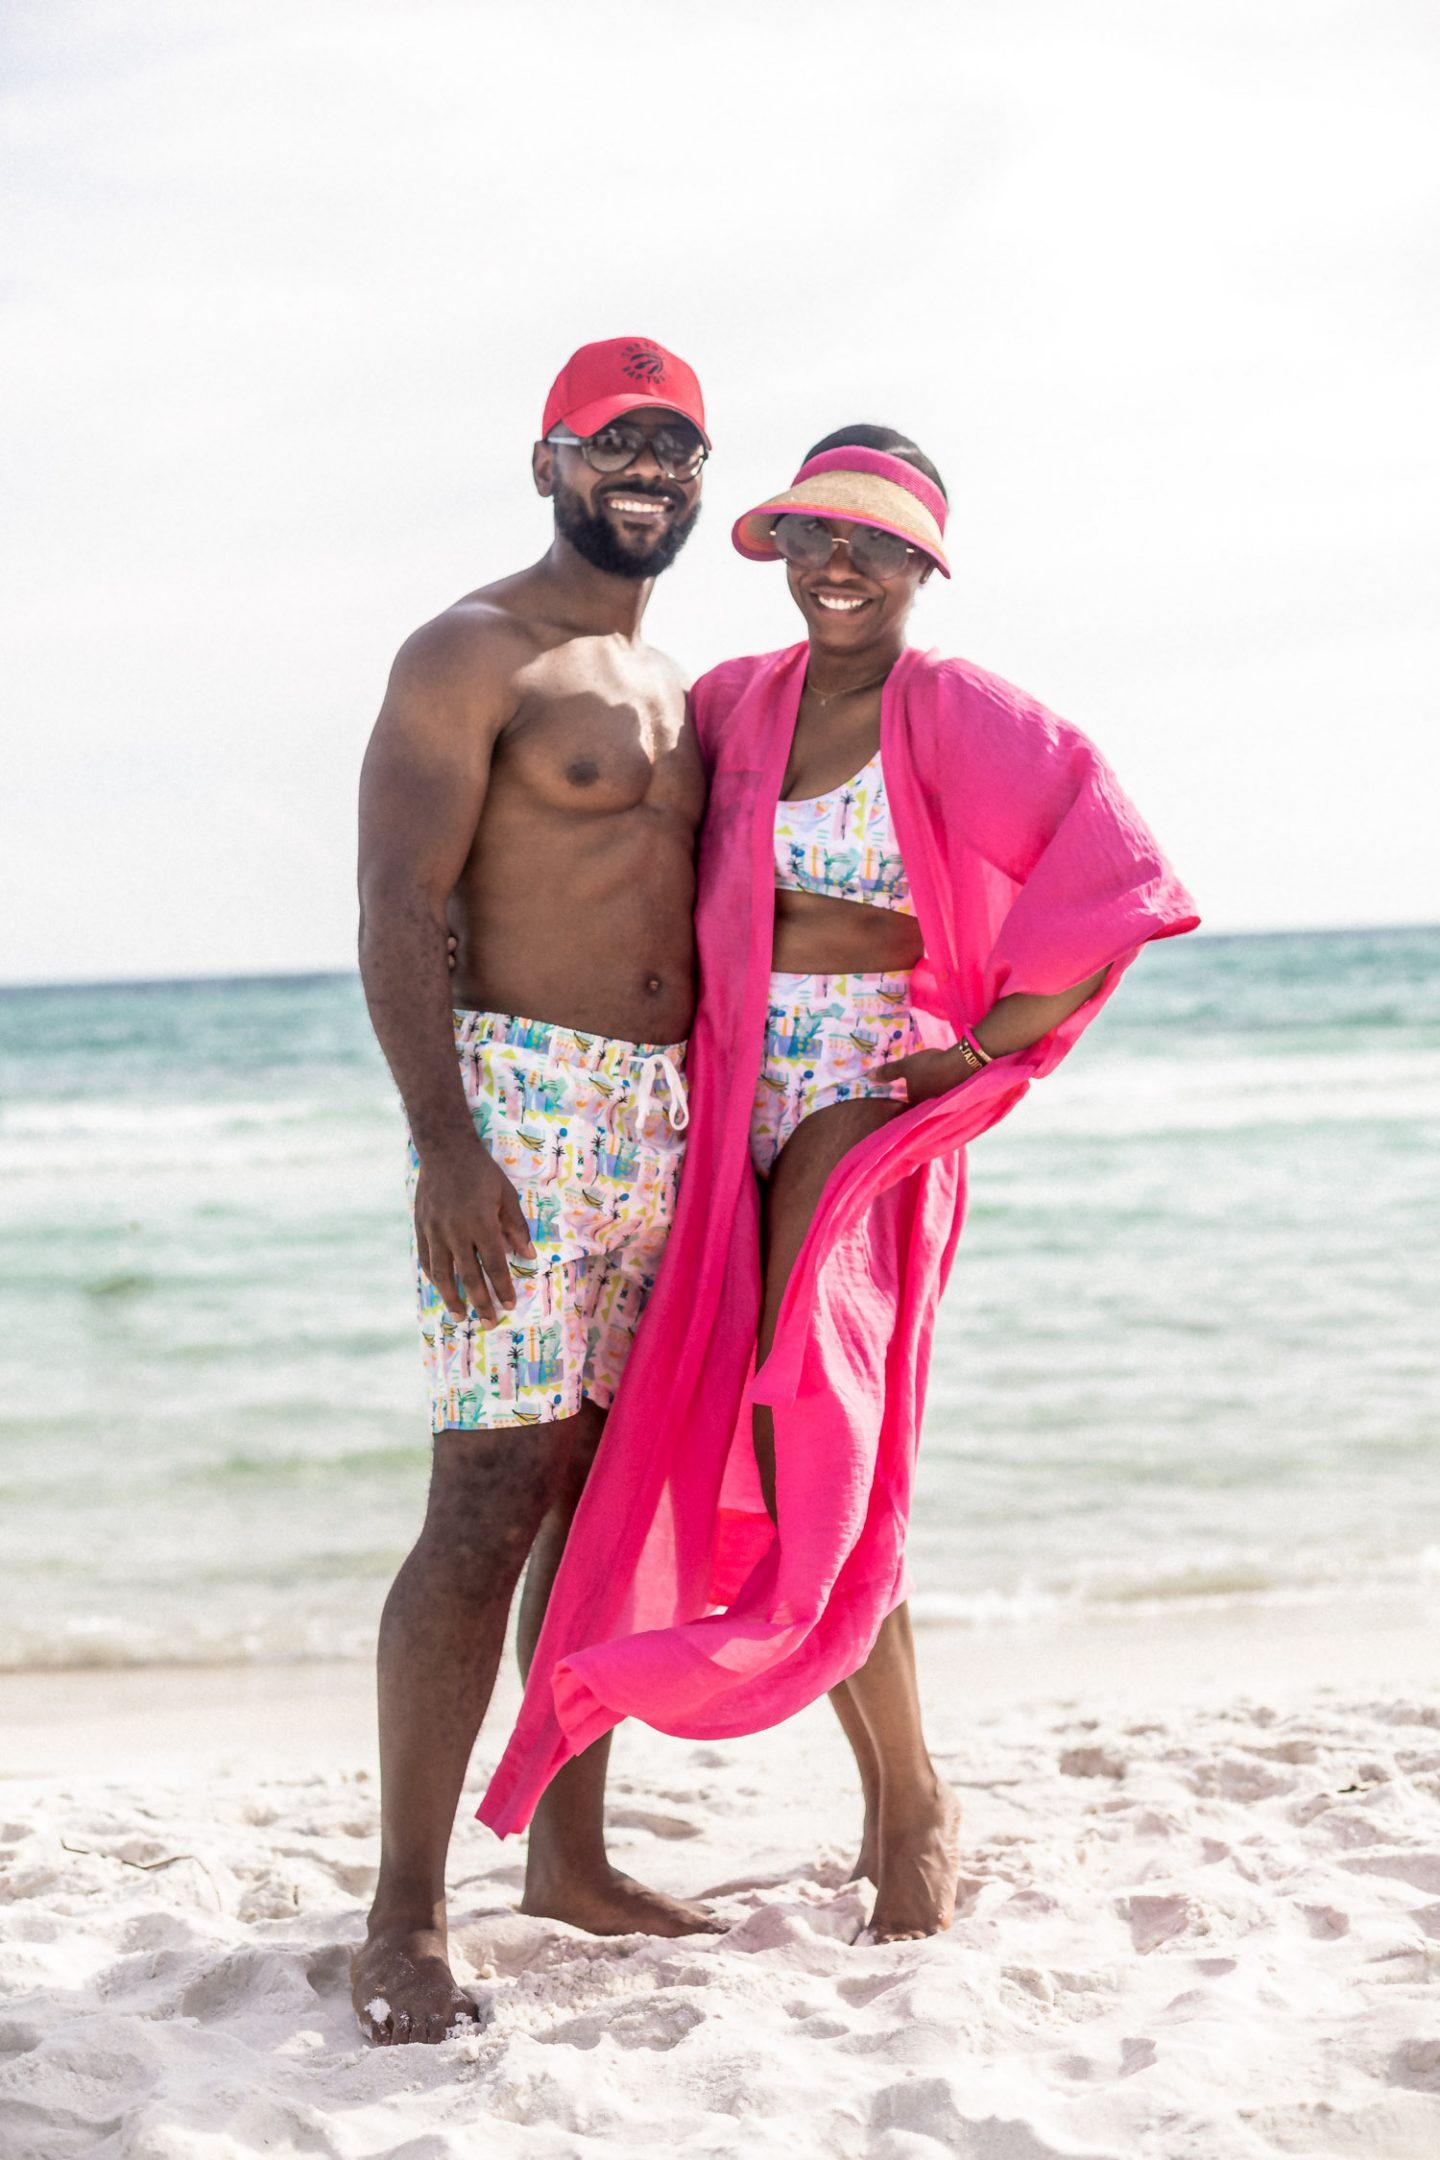 beach vacation during covid 19, alys beach, h&m kimono, pink kimono